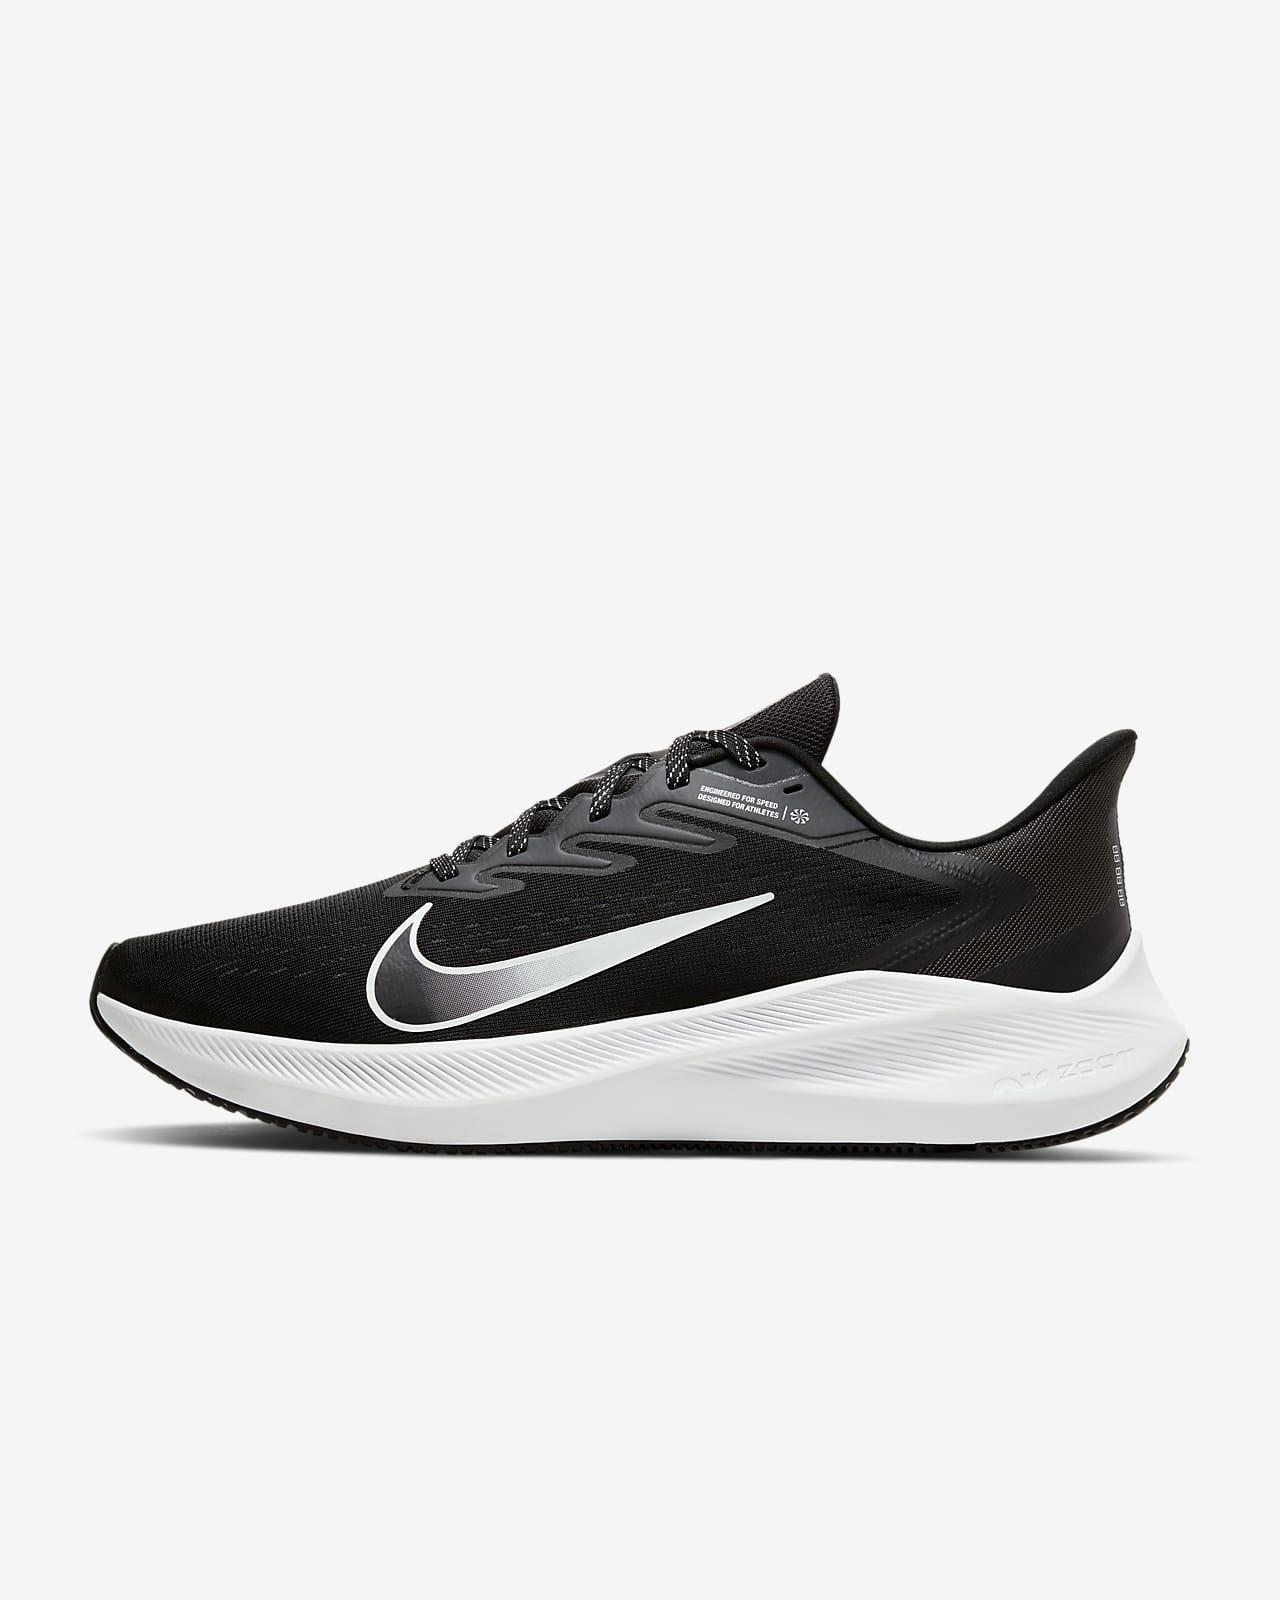 Scarpa da running Nike Air Zoom Winflo 7 - Uomo